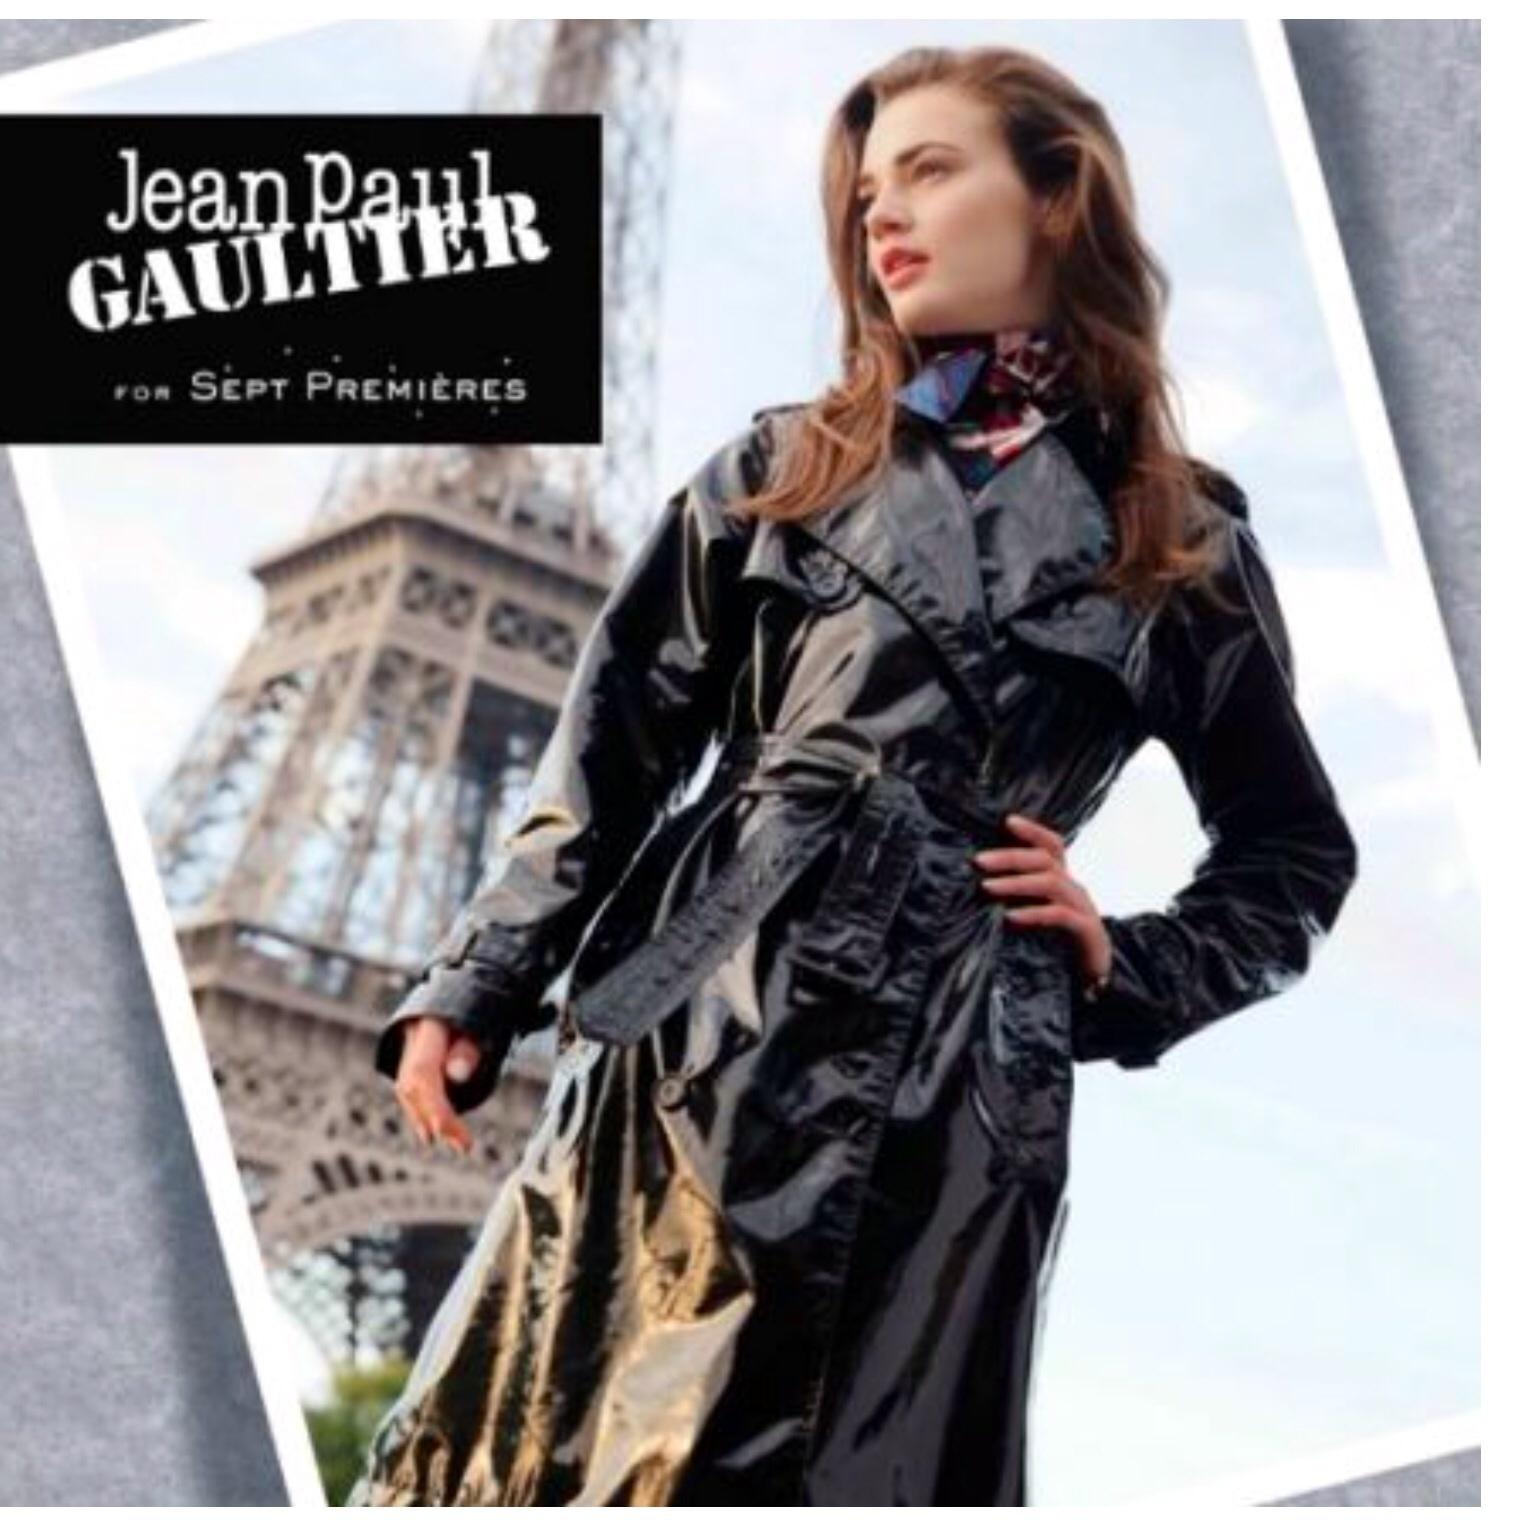 JEAN PAUL GAULTIER  for  Sept Premieres_b0210699_23290242.jpg